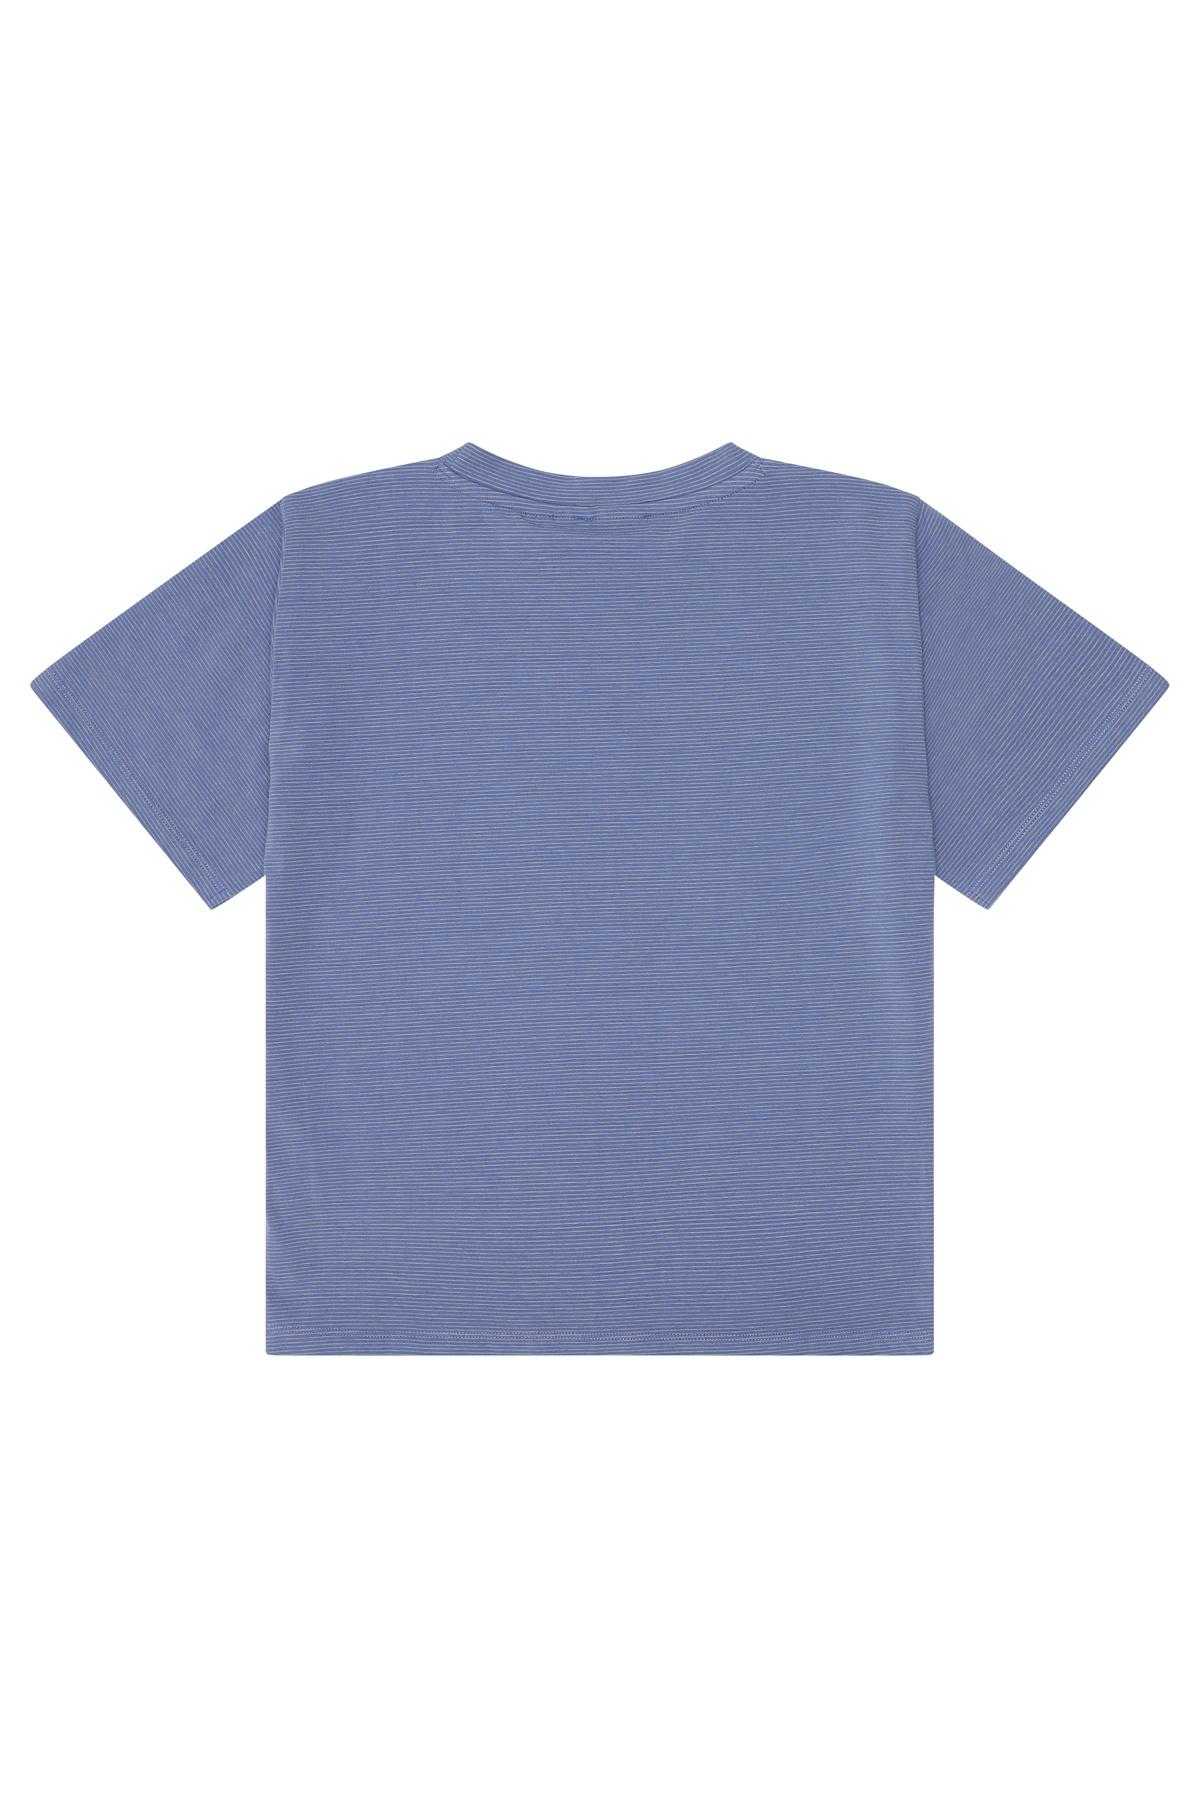 Dain t-shirt - Croissant-2